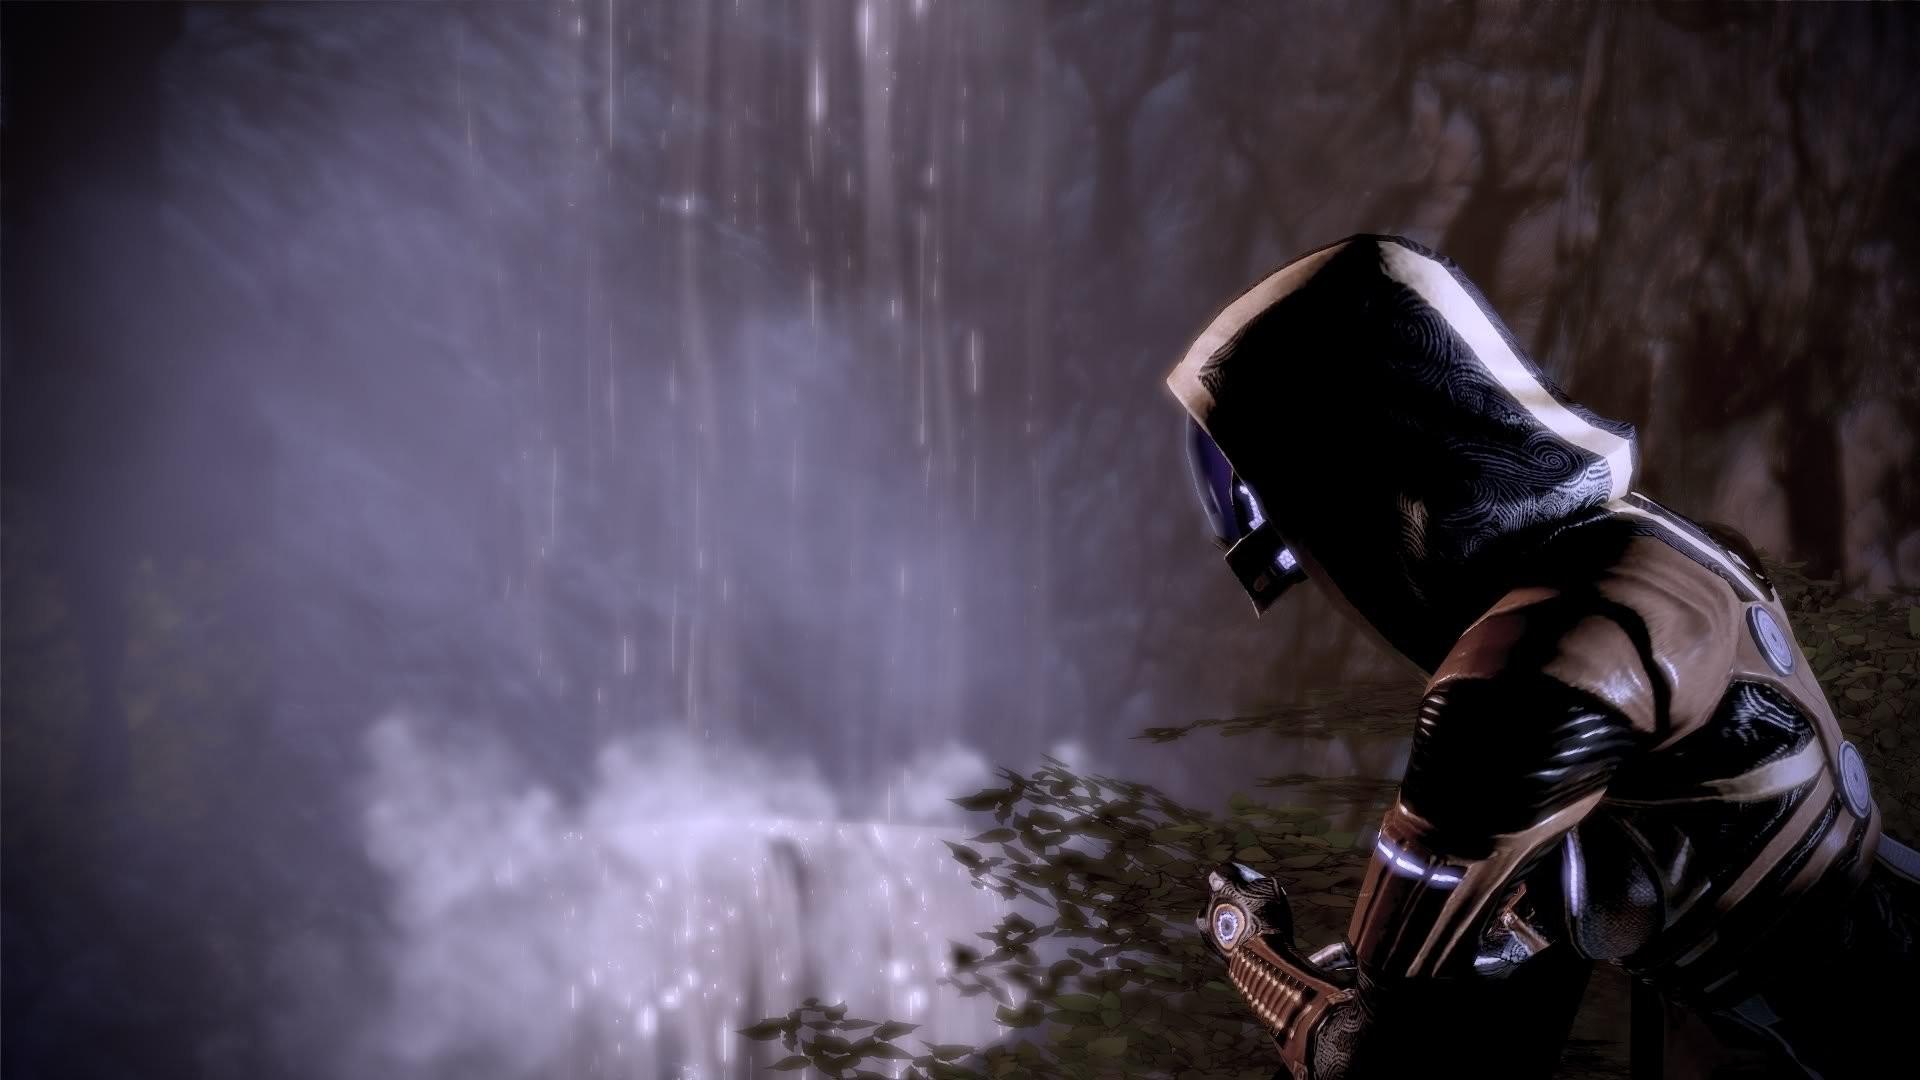 Mass Effect Tali 187662 …